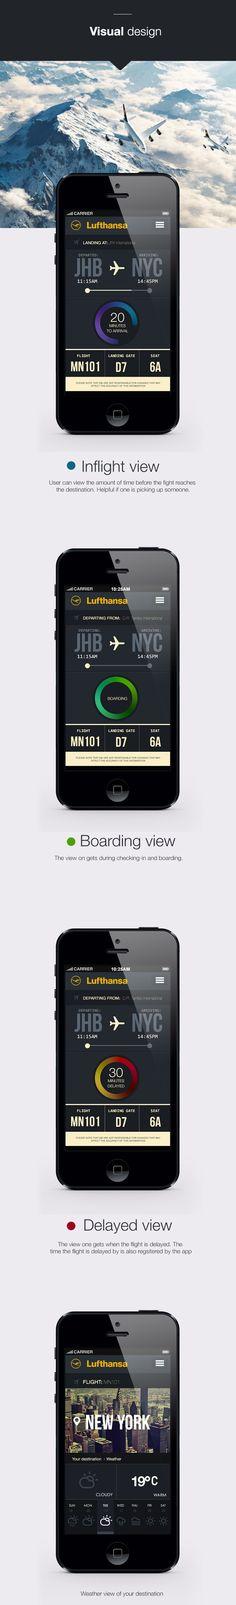 Lufthansa flight tracking app IOS7 by Calvin Pedzai. #webdesign #interactivedesign #designinspiration